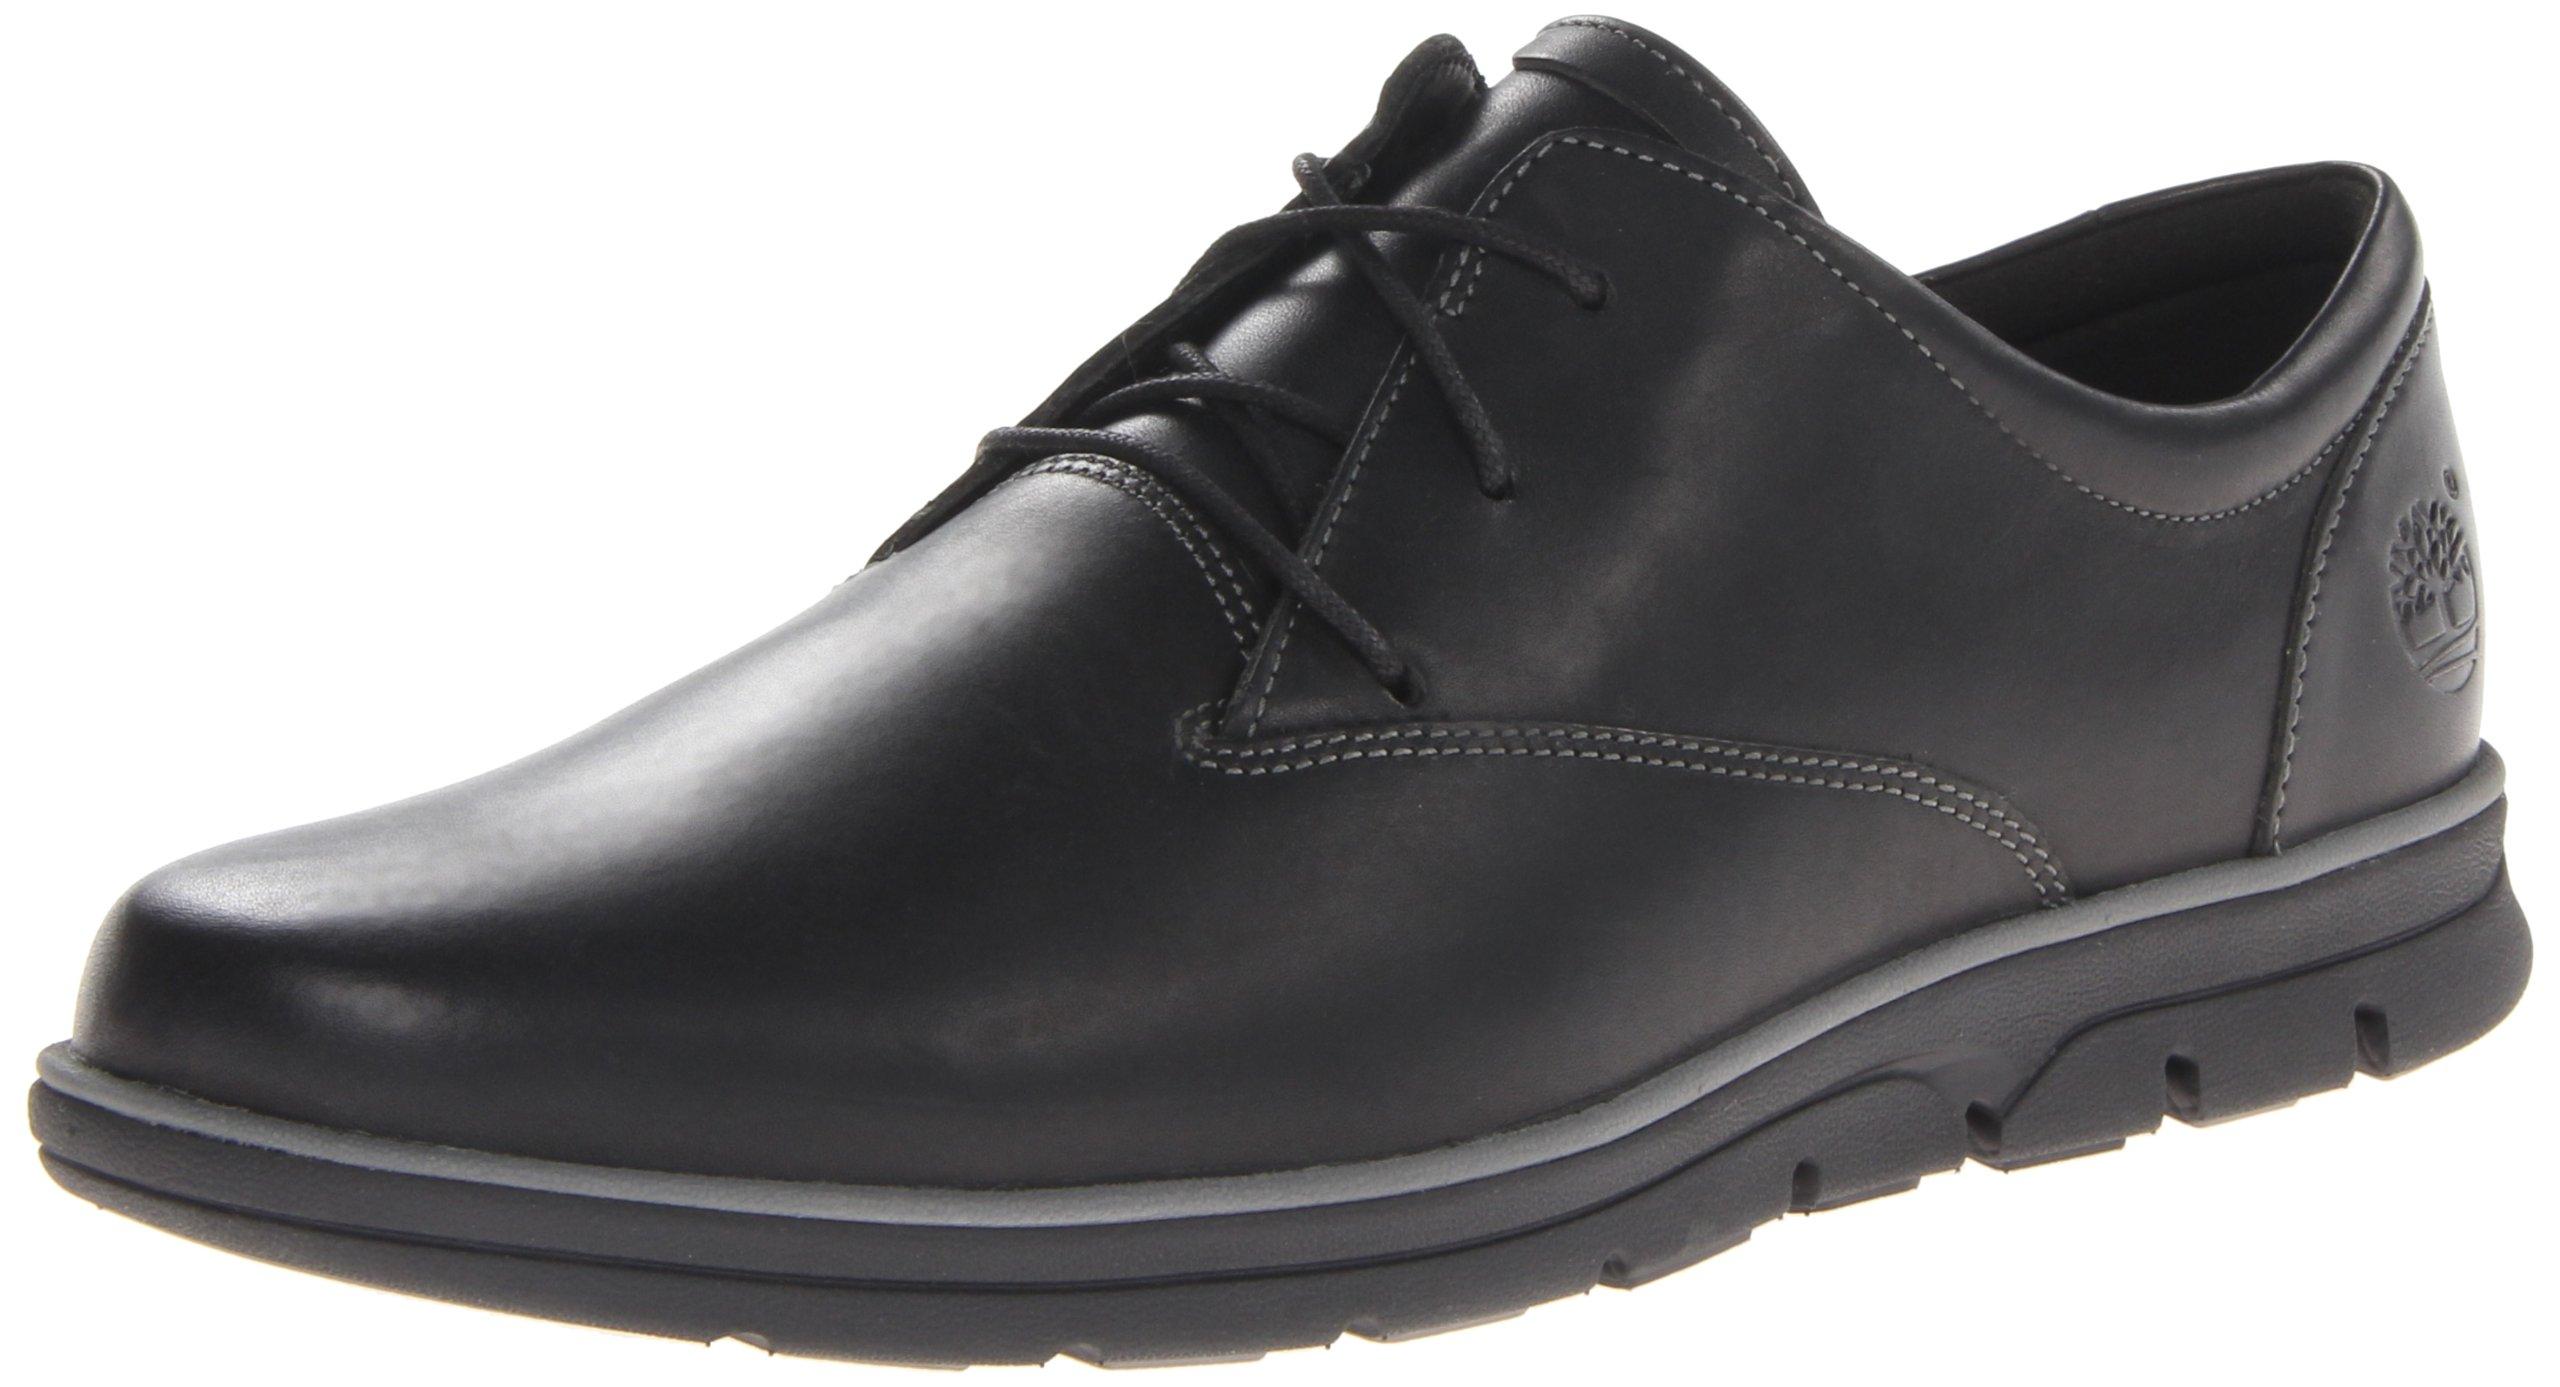 Timberland Men's Bradstreet Plain Toe Oxford,Black,11 M US